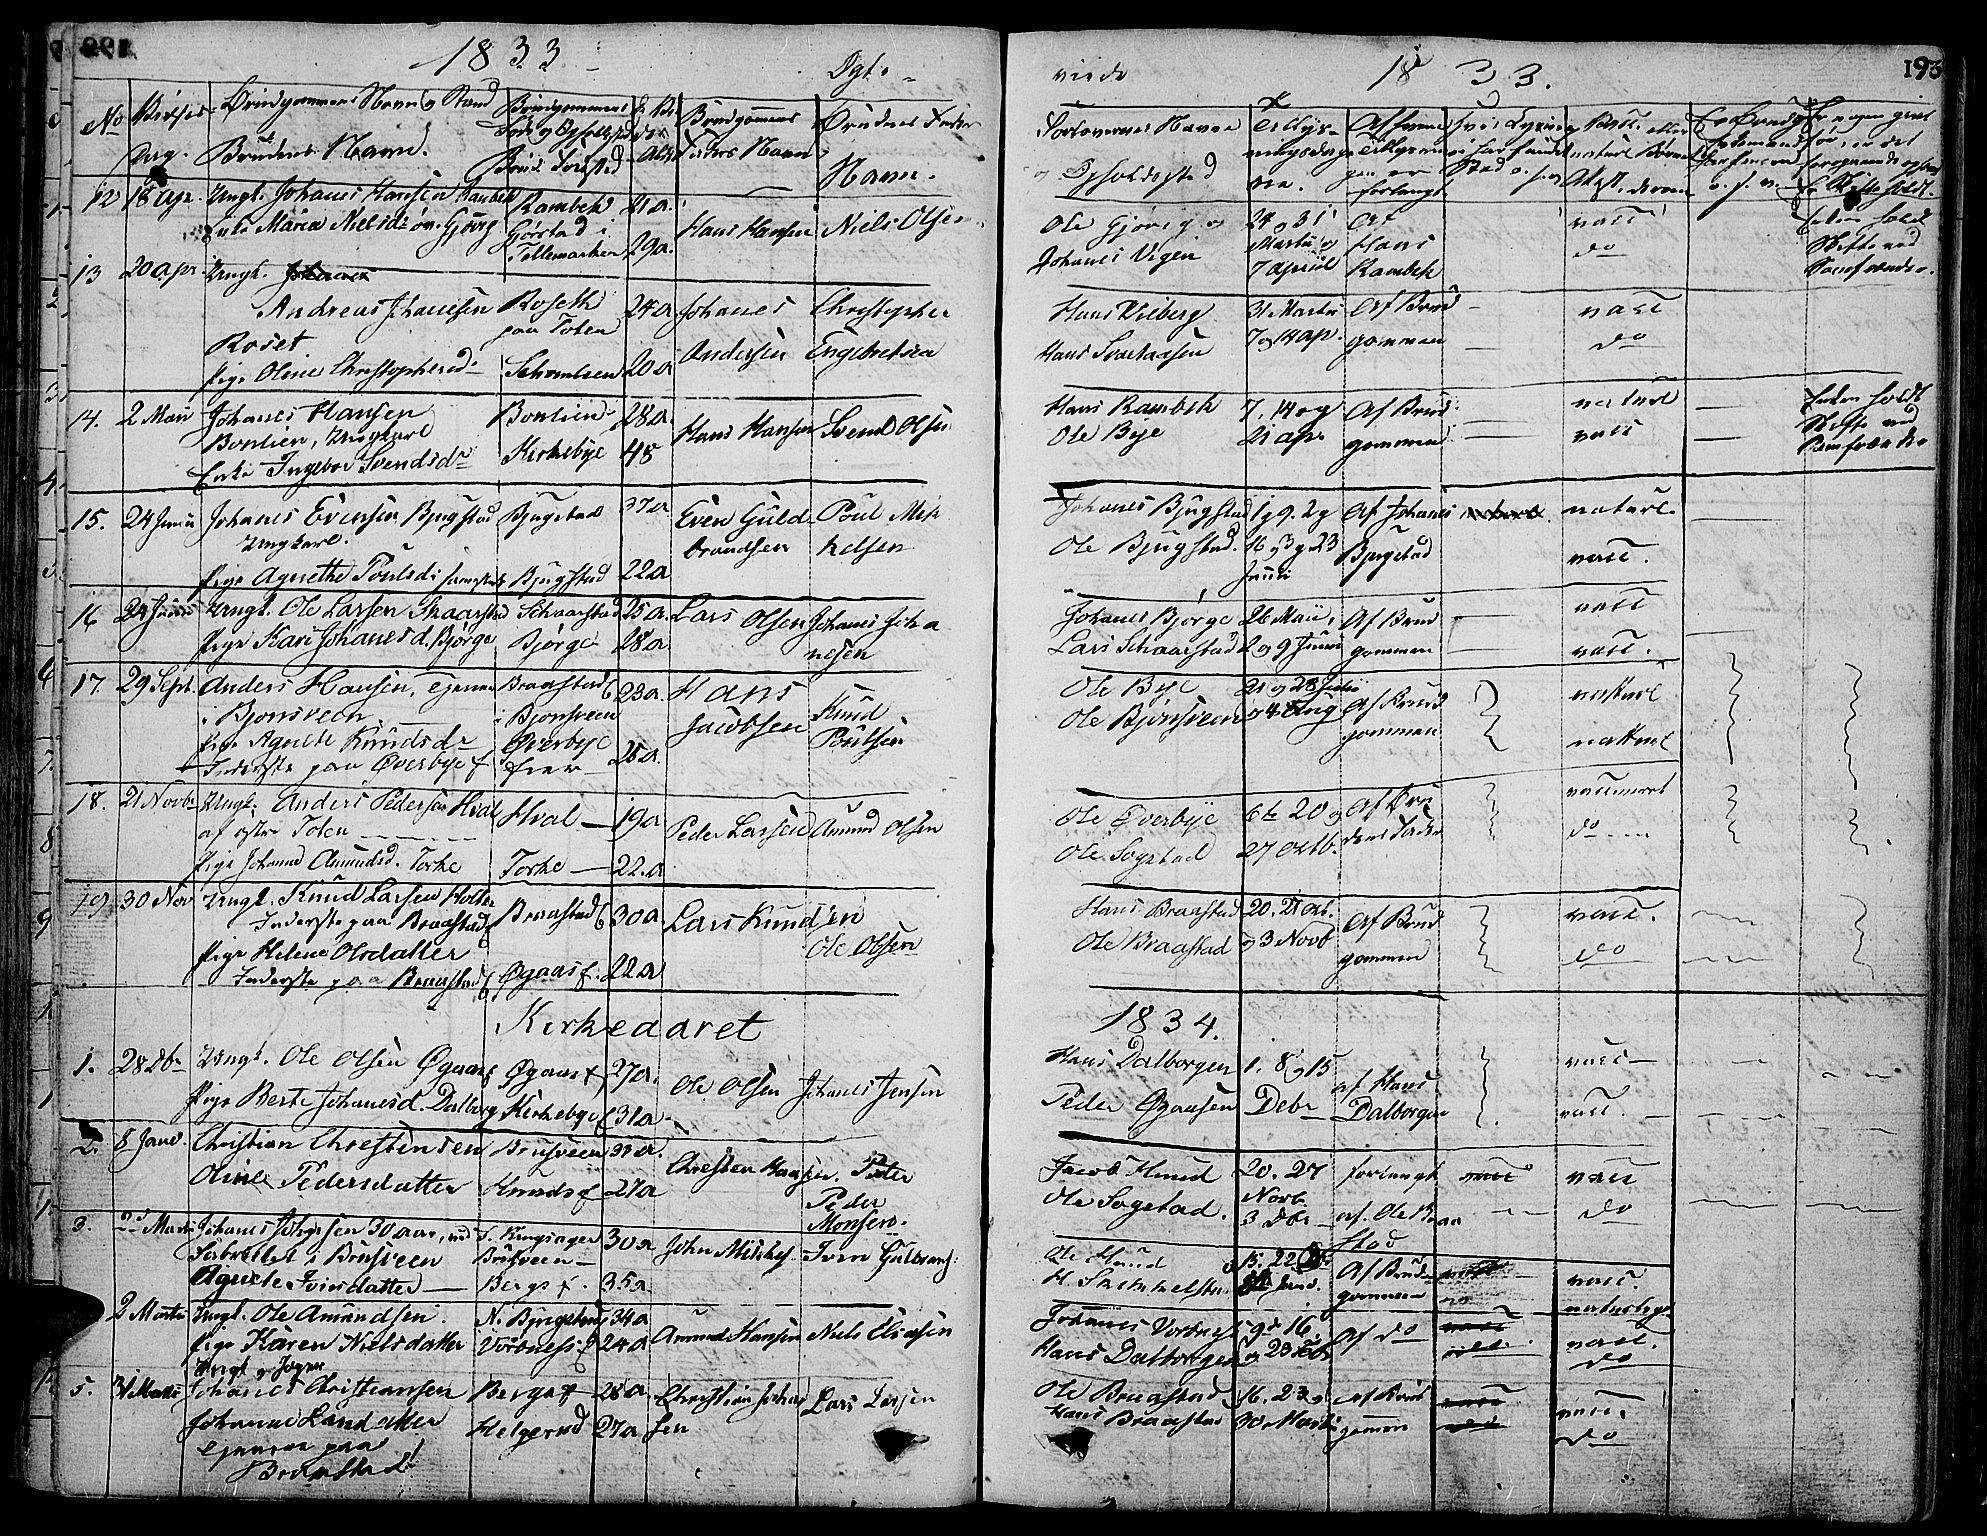 SAH, Vardal prestekontor, H/Ha/Hab/L0004: Klokkerbok nr. 4, 1831-1853, s. 193